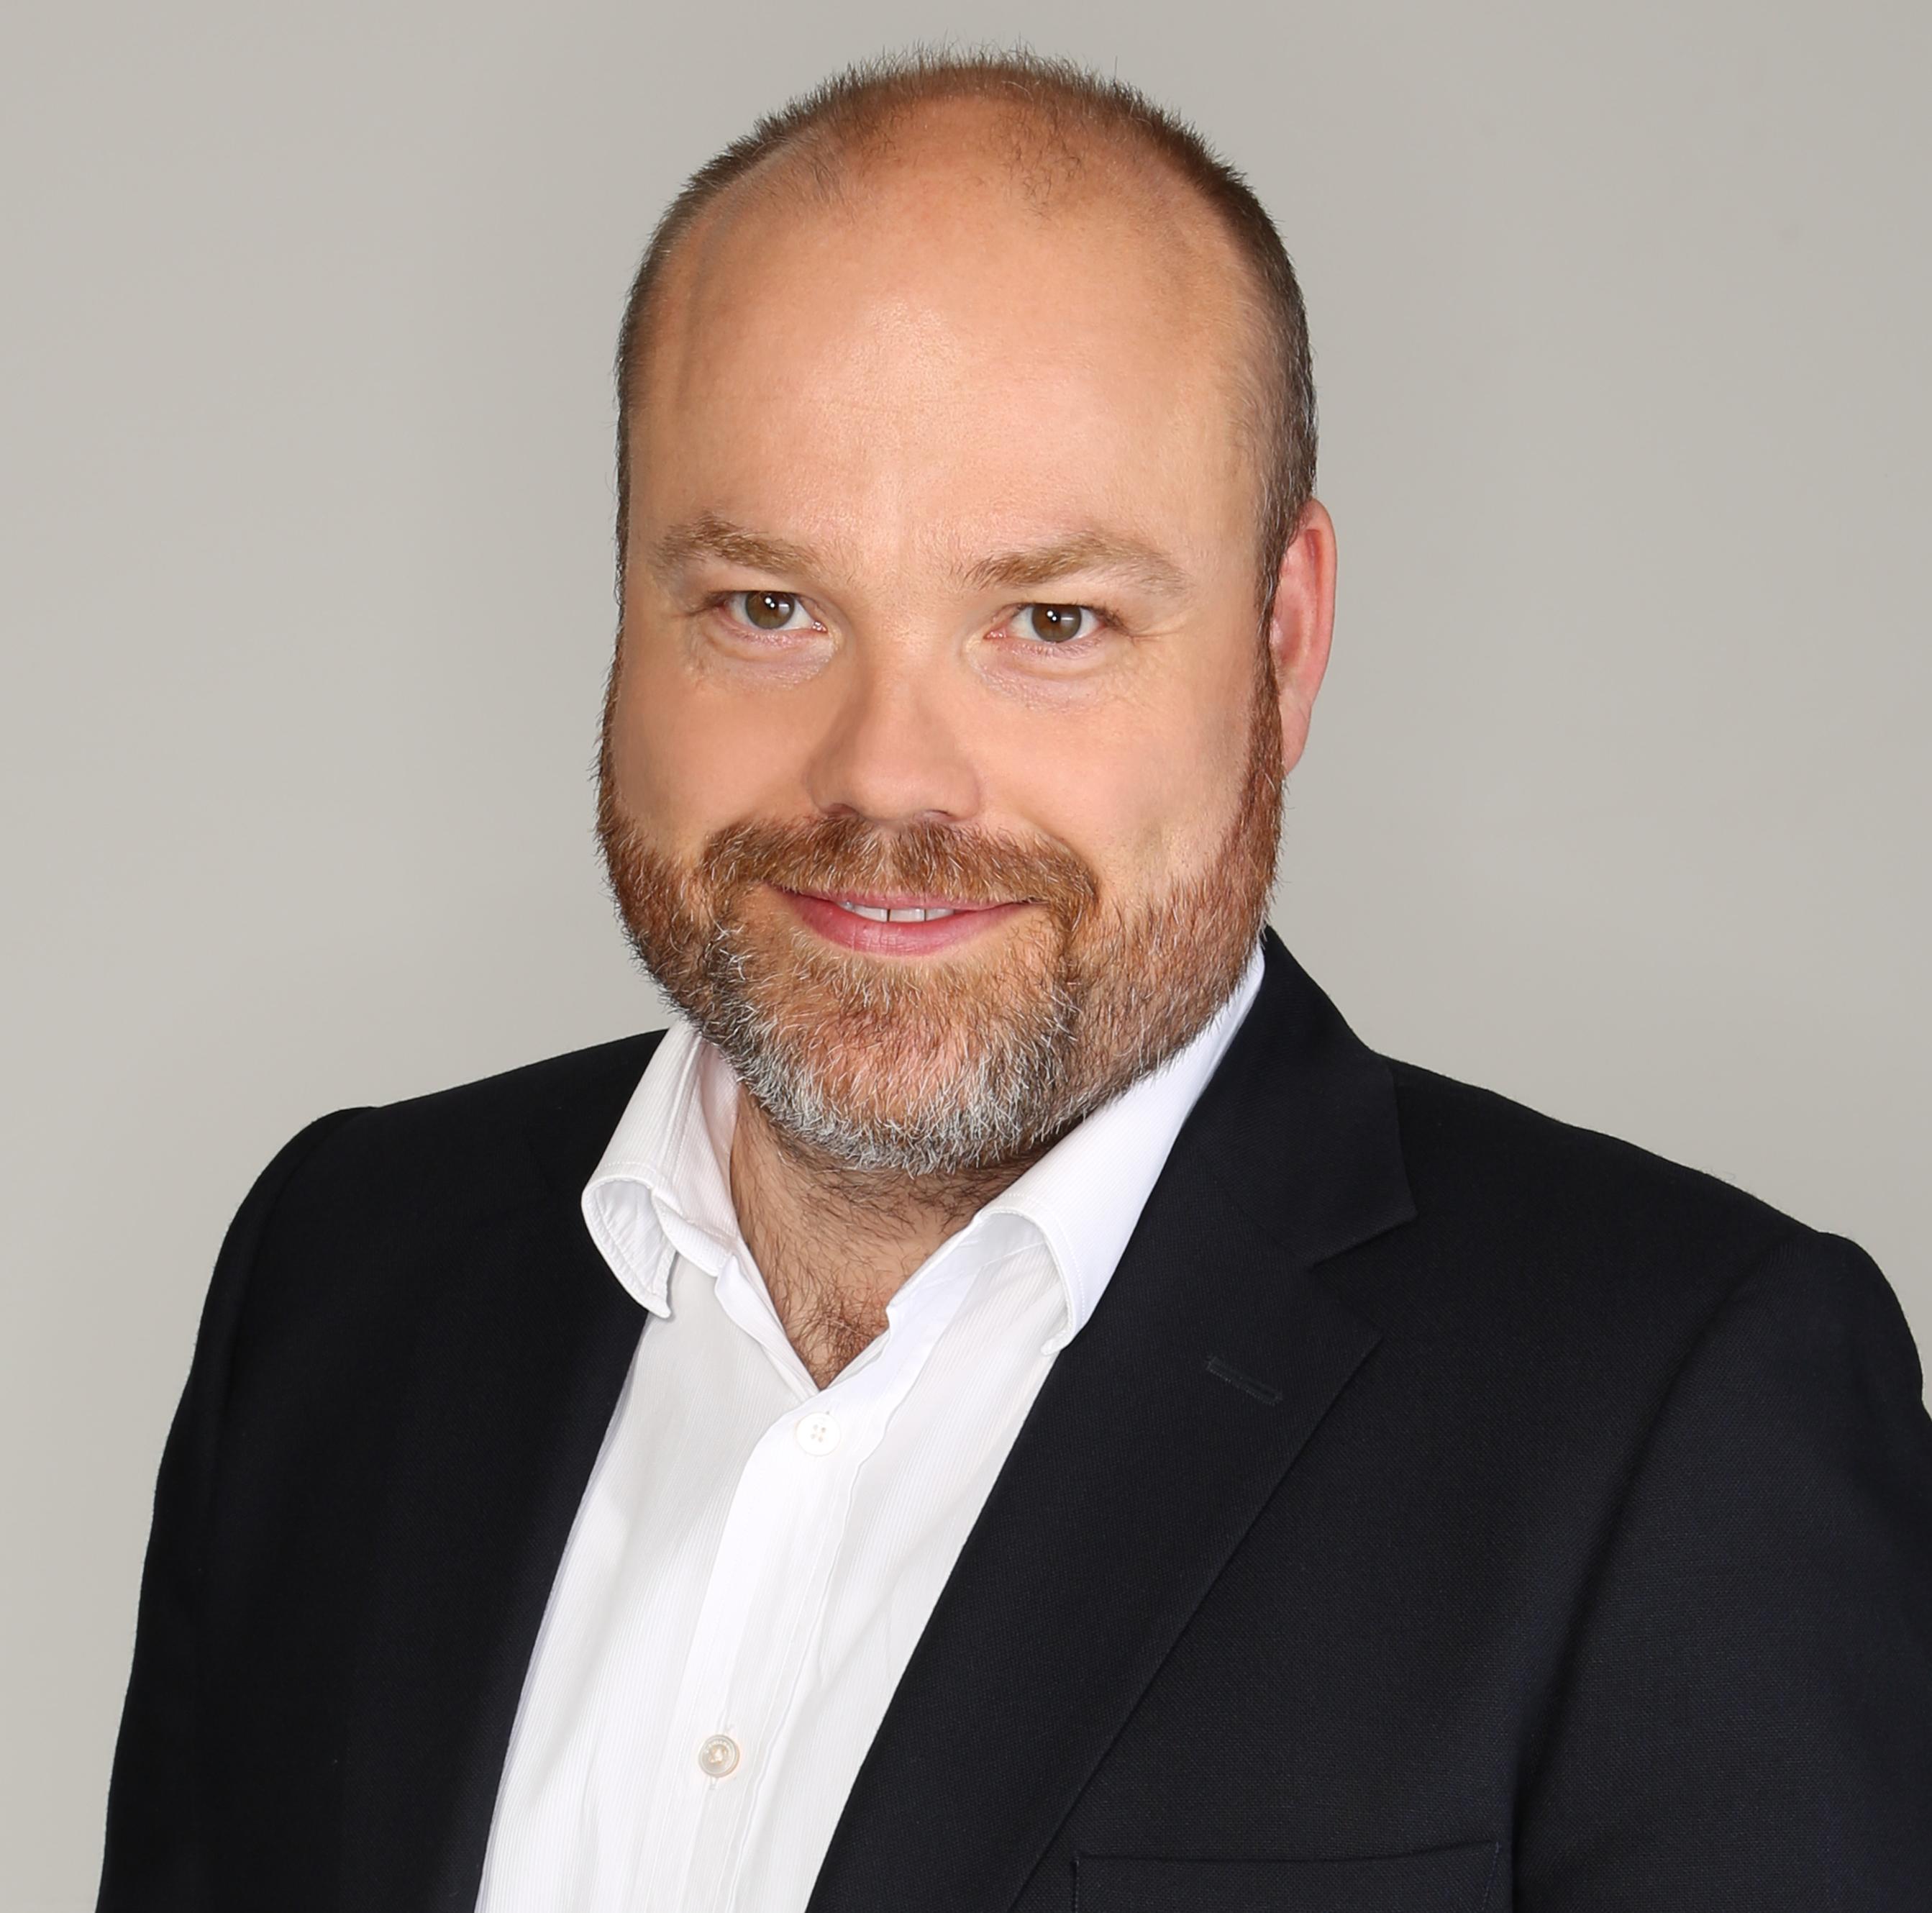 Zalando SE Supervisory Board - Anders Holch Povlsen